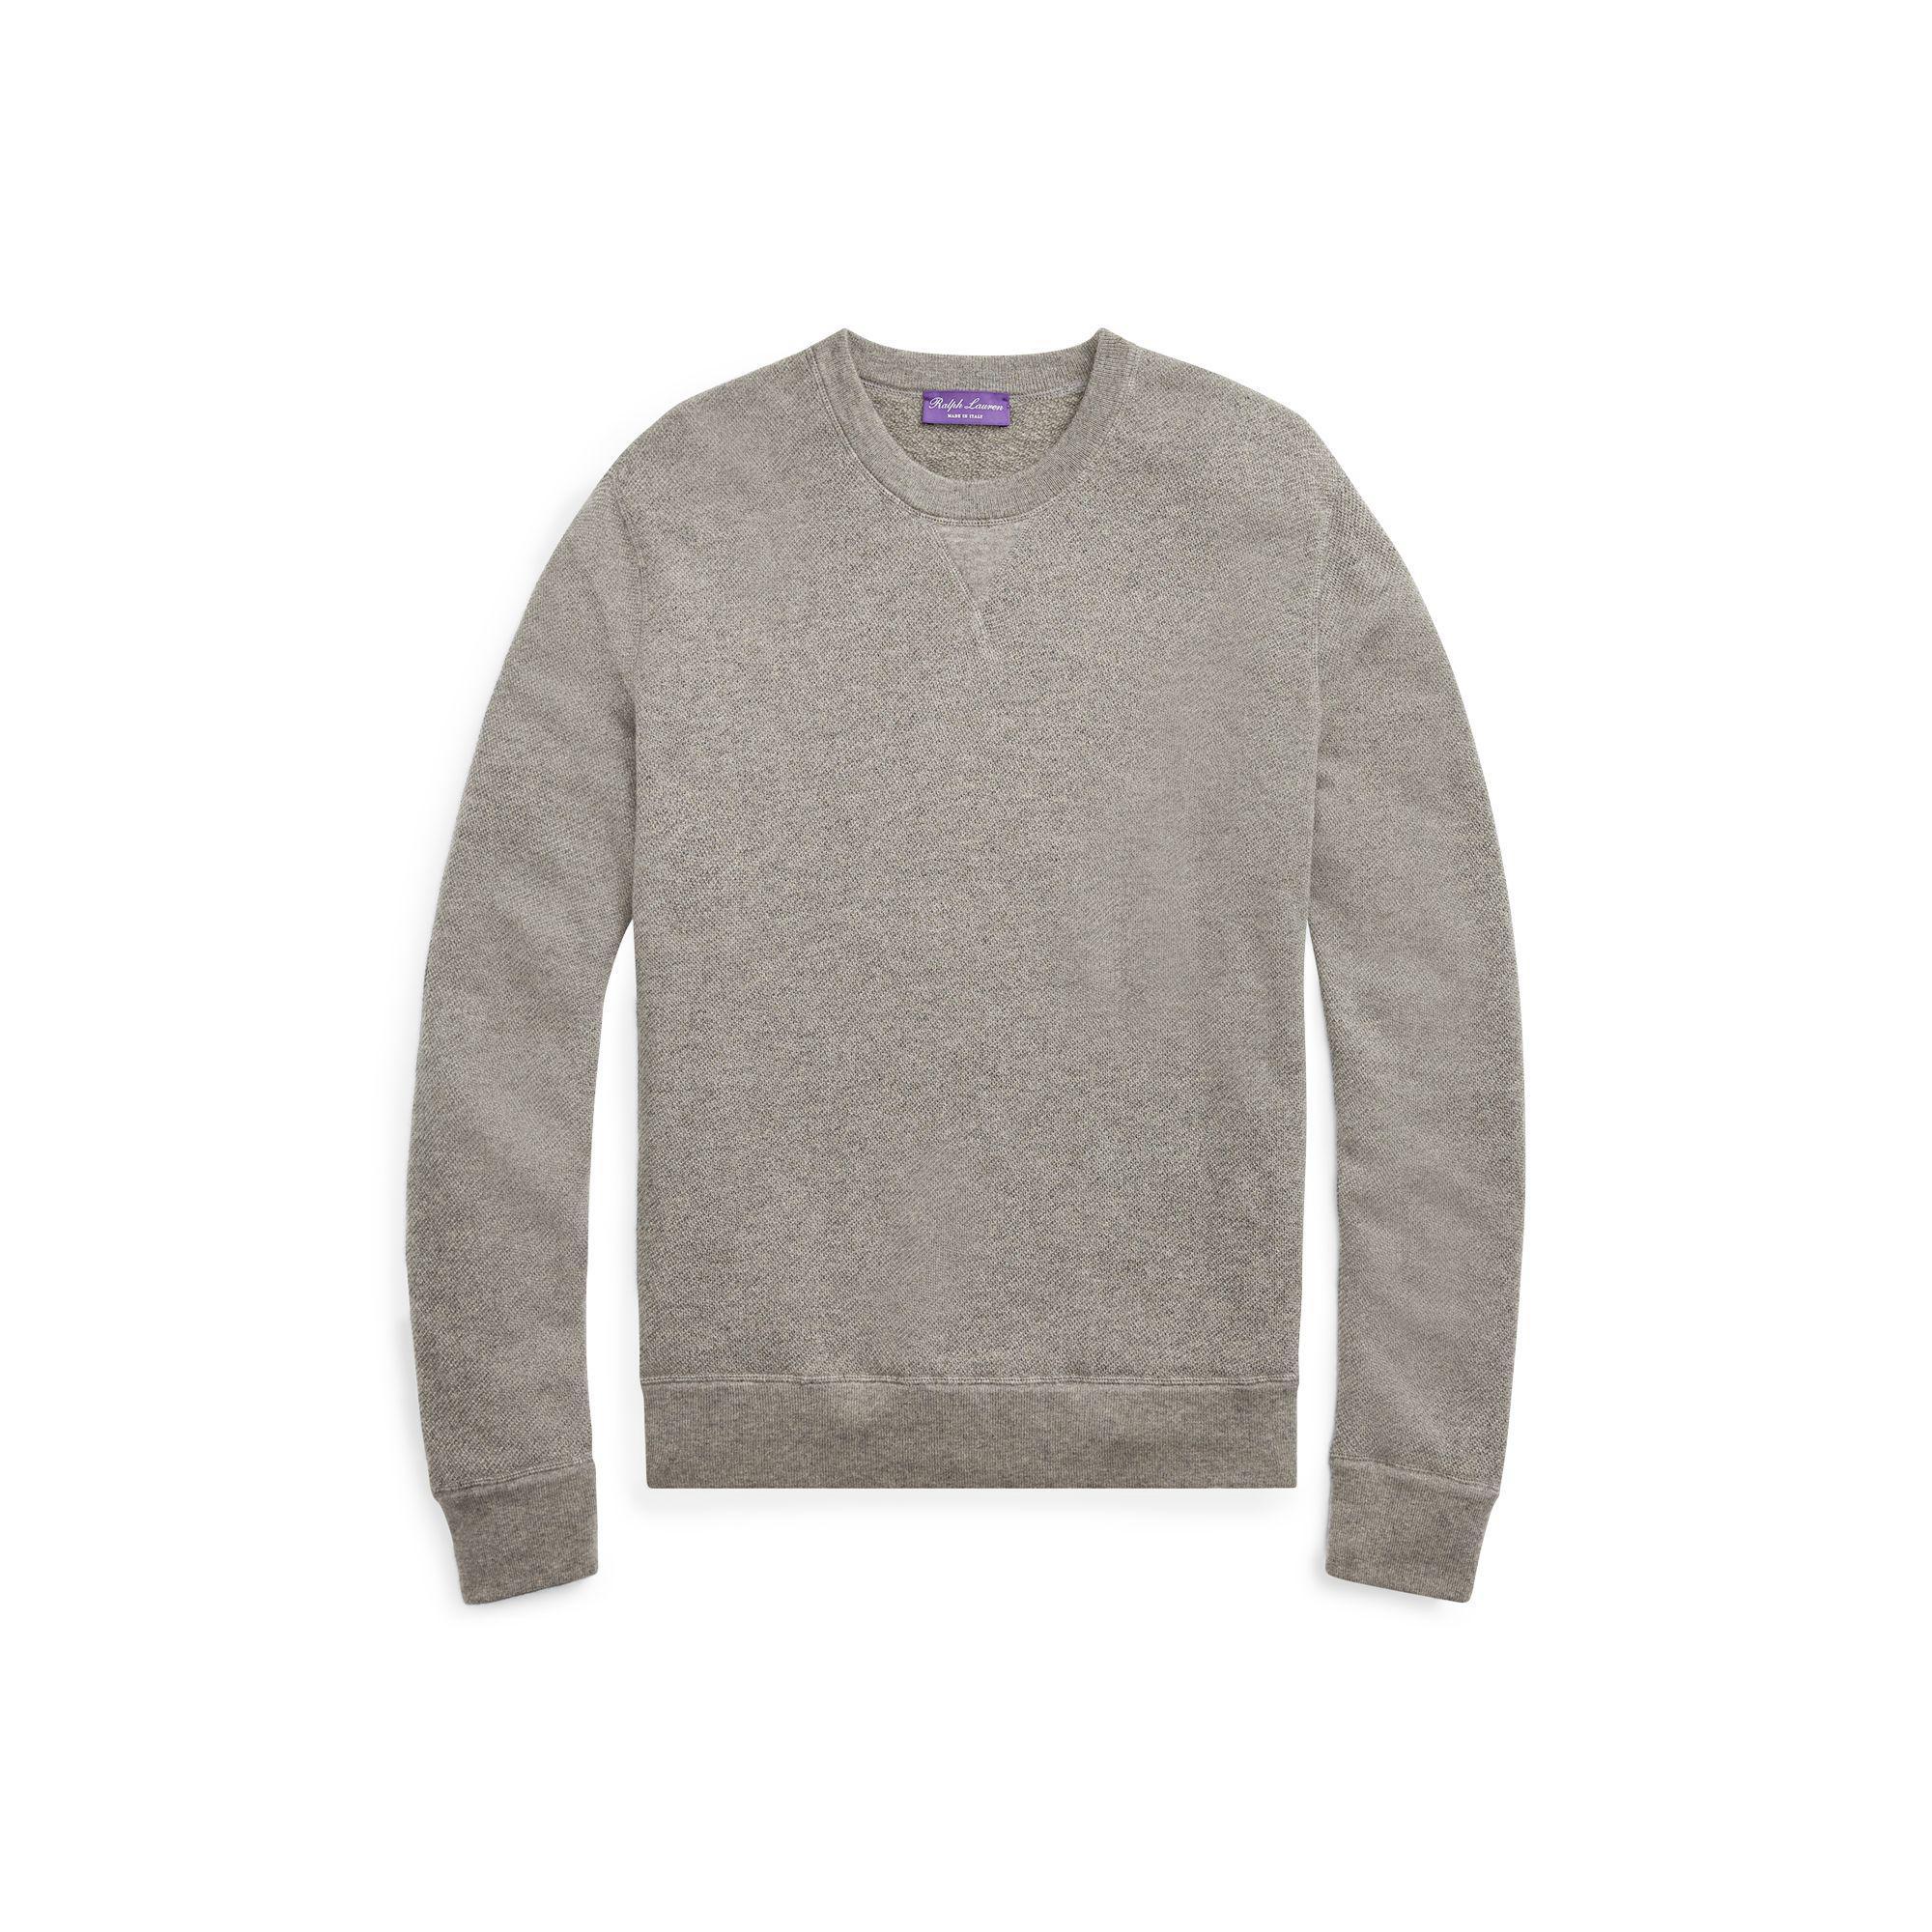 ab6e243484be Lyst - Ralph Lauren Purple Label Cashmere Crewneck Sweater in Gray ...